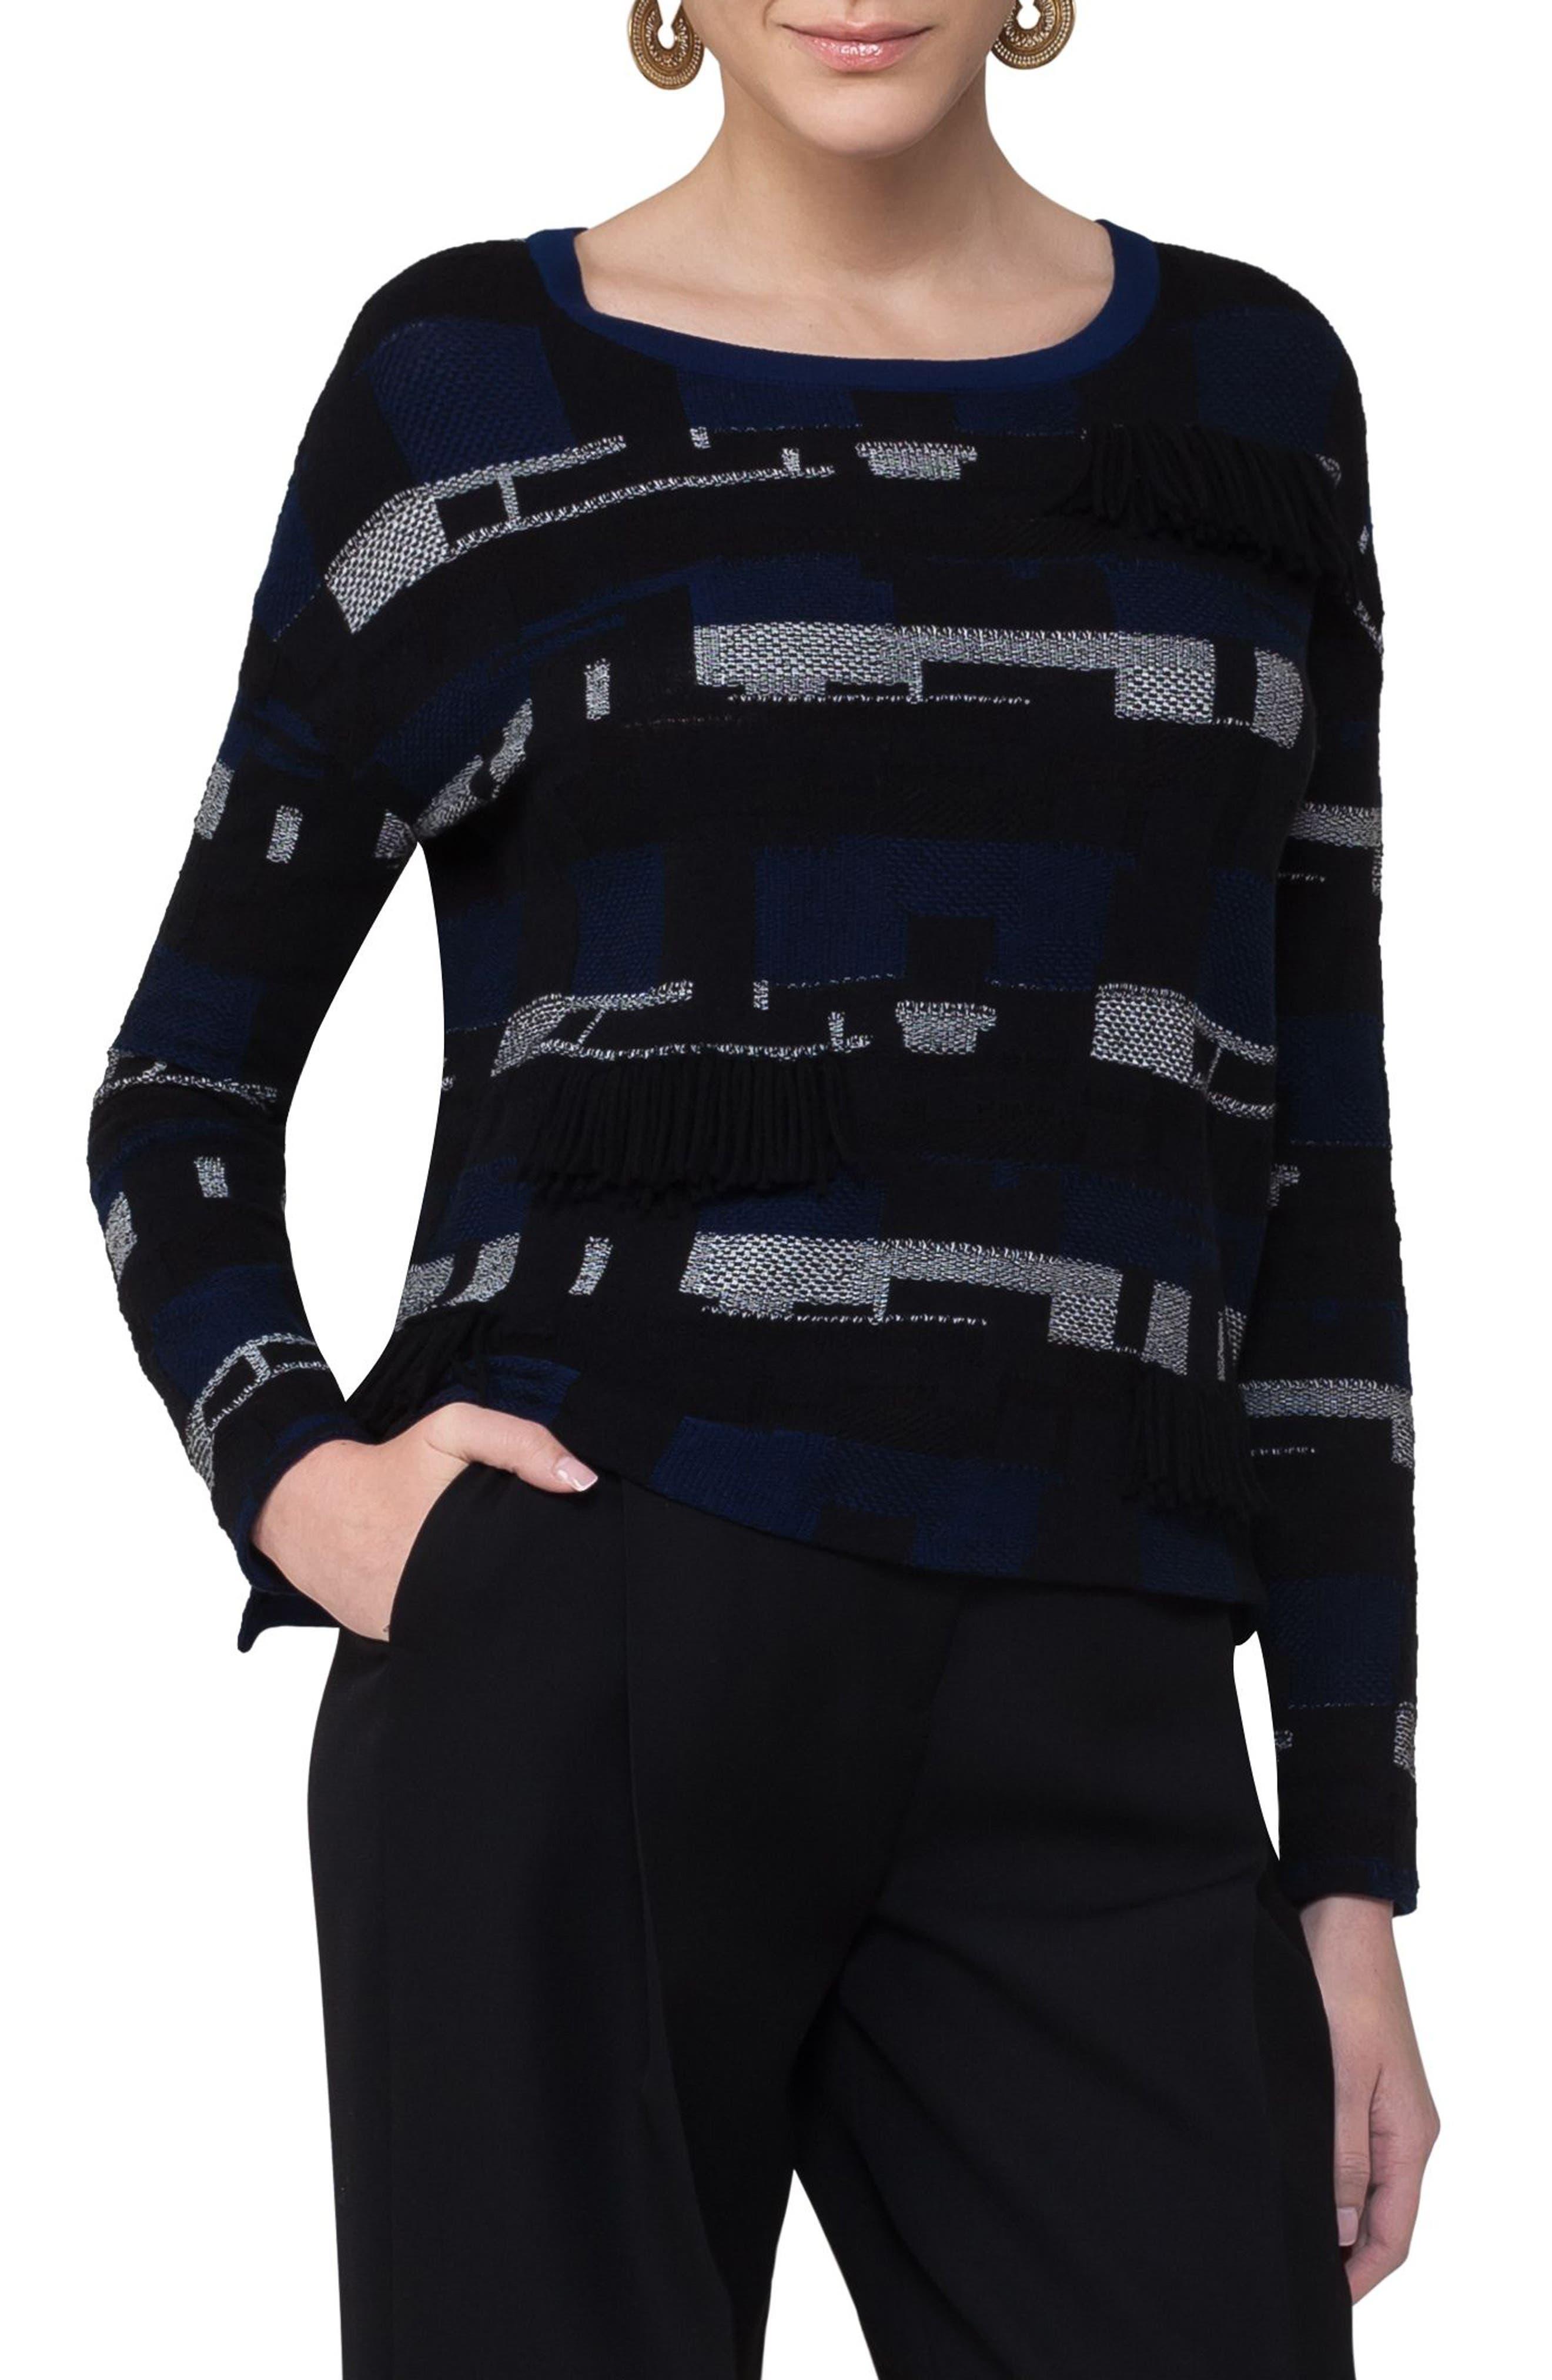 AKRIS PUNTO Fringe Jacquard Cotton Blend Pullover